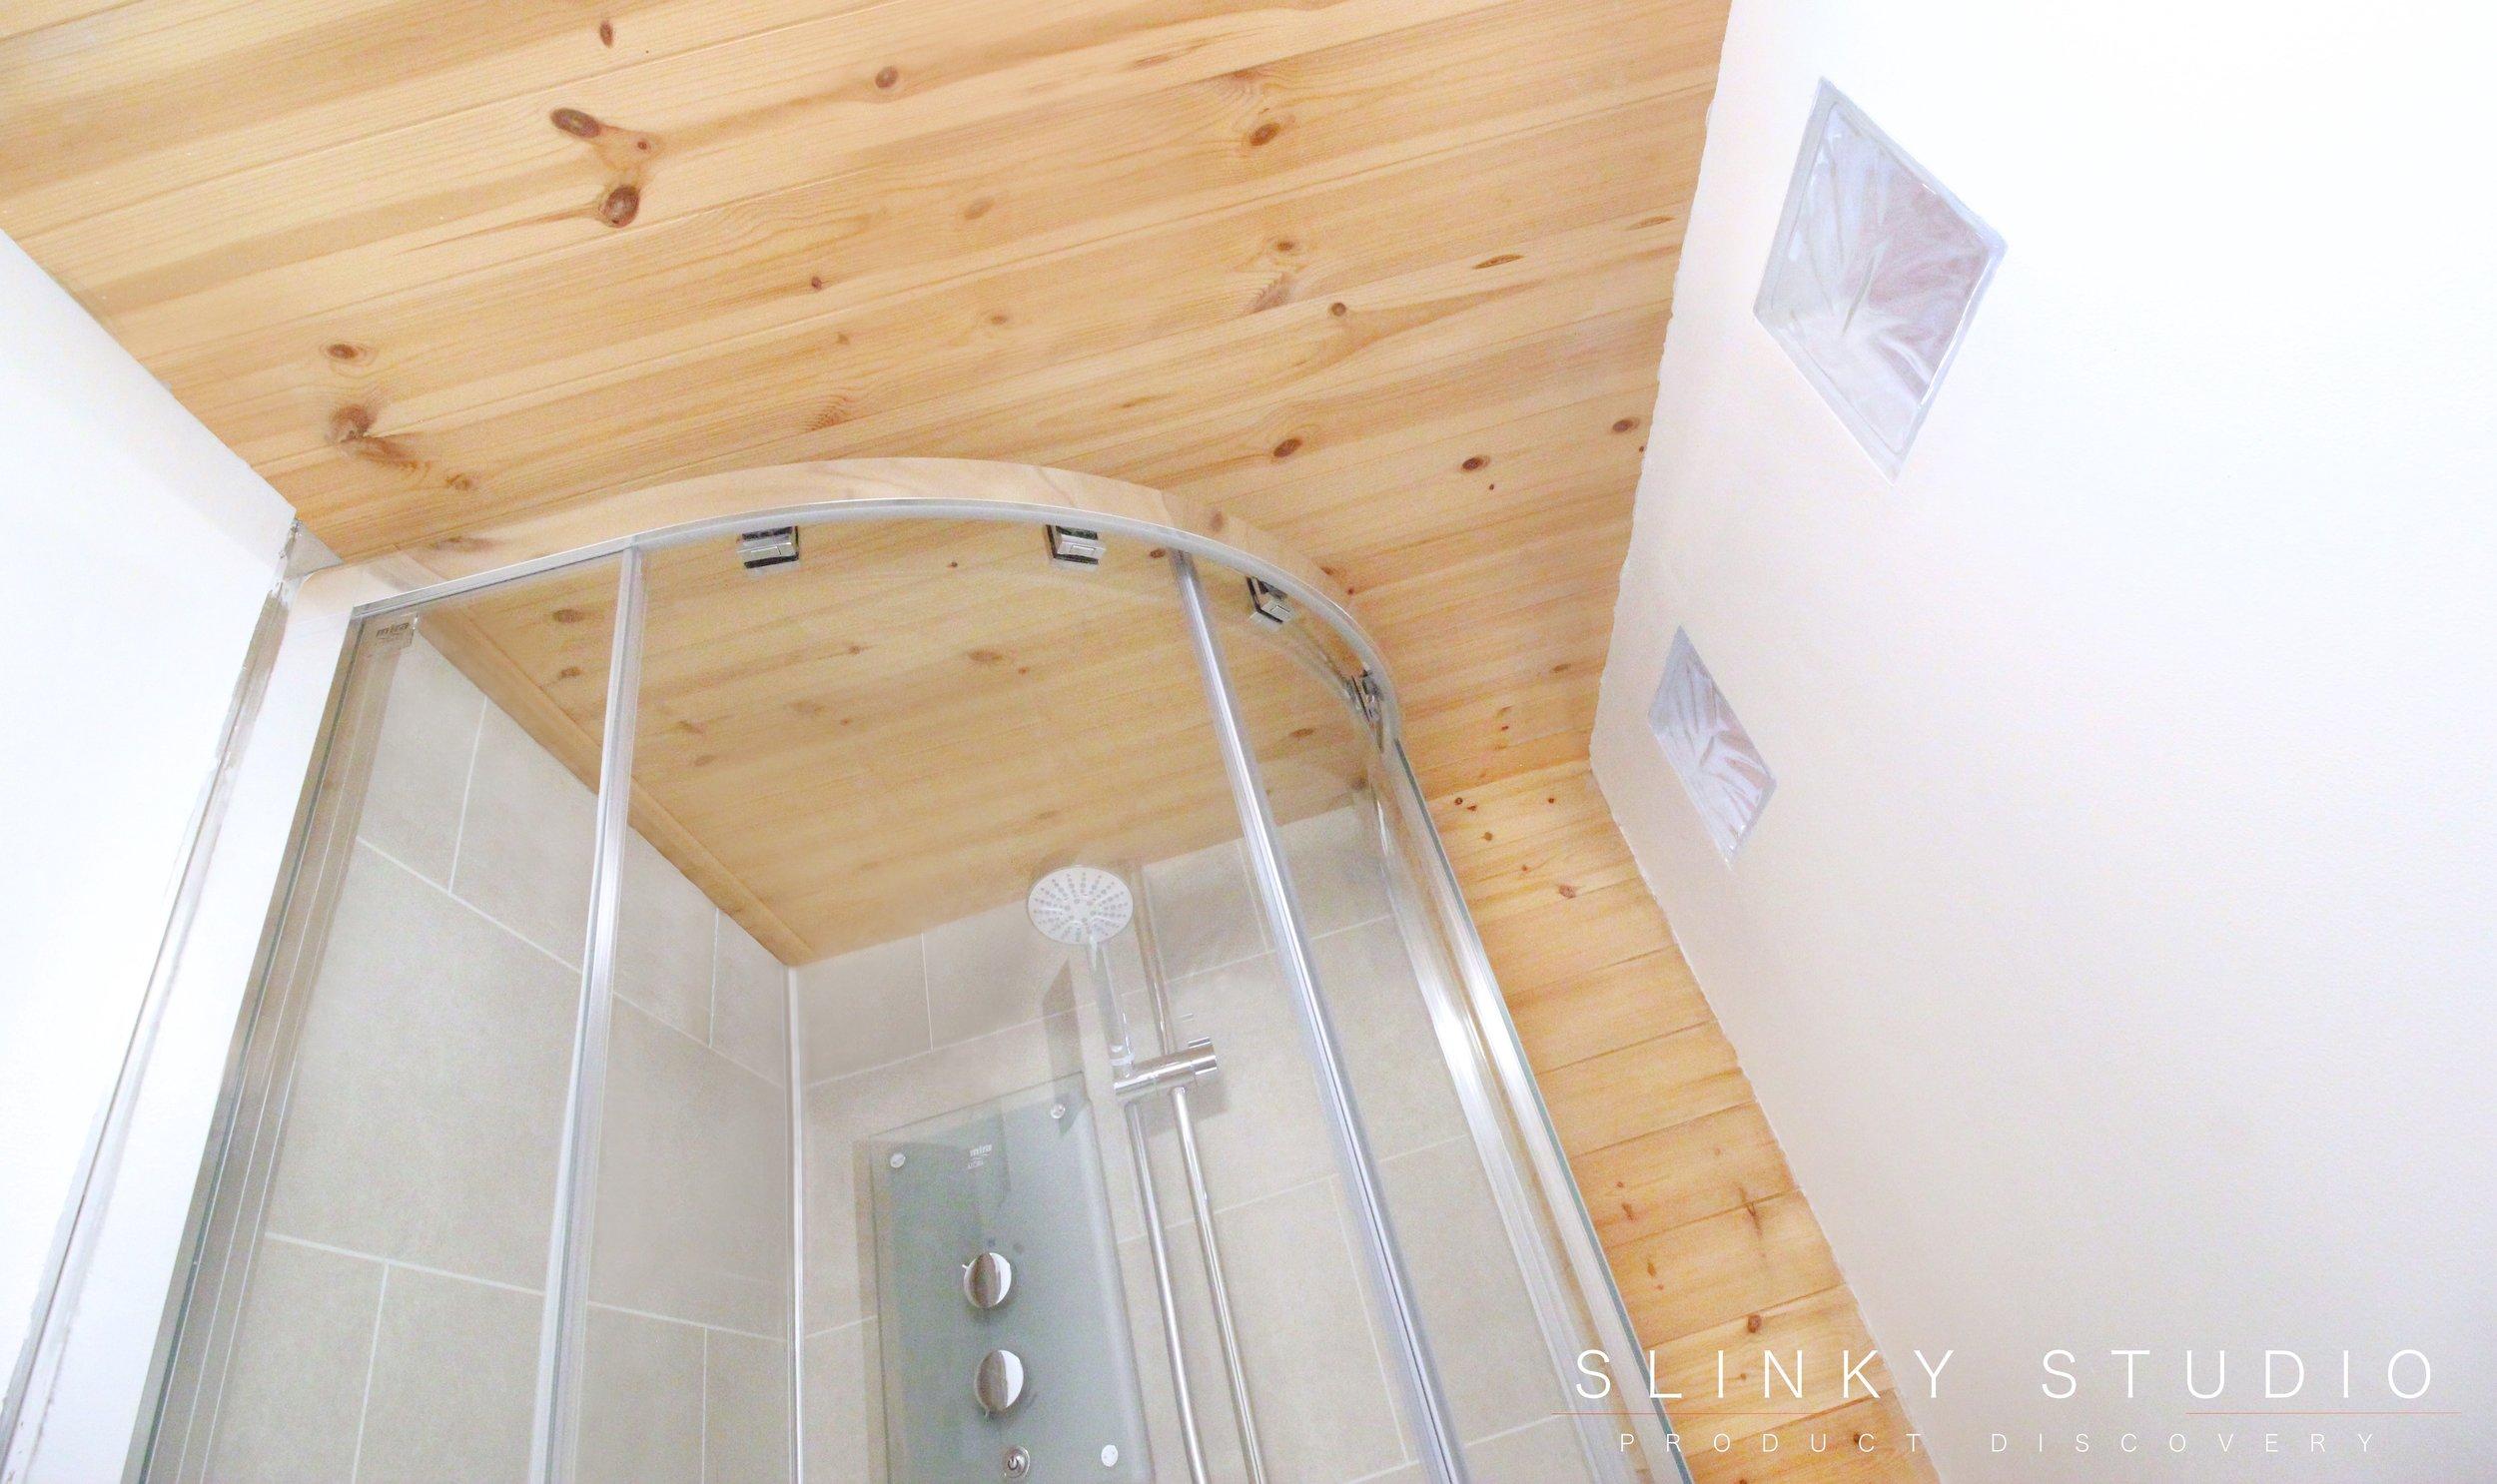 Mira Leap Quadrant Shower Glass Walls & Doors Top View.jpg